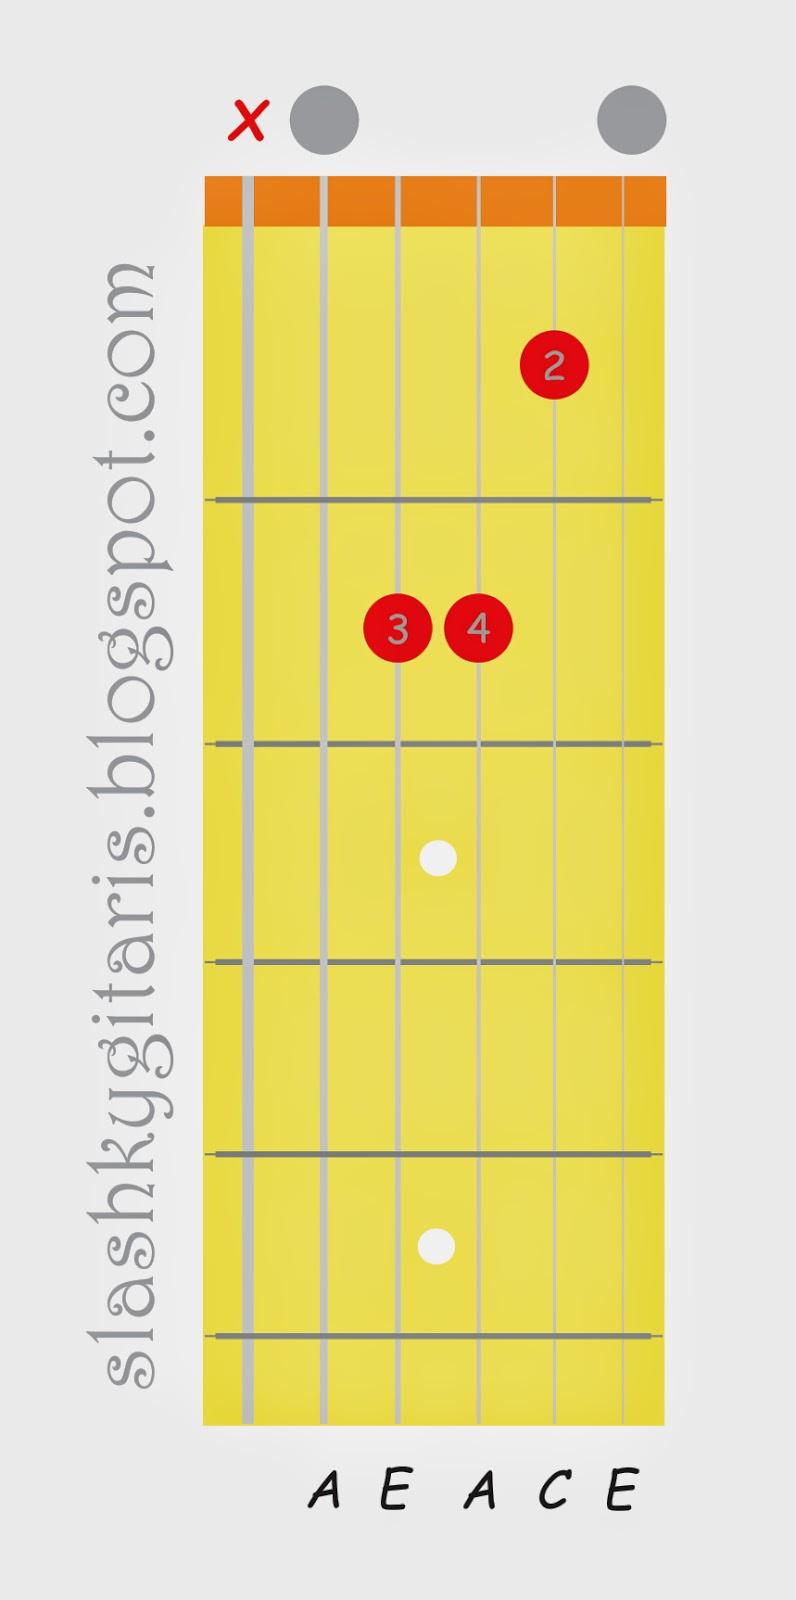 belajar chord gitar, belajar gitar, belajar gitar pemula, belajar kunci gitar, kunci A minor, kunci gitar,